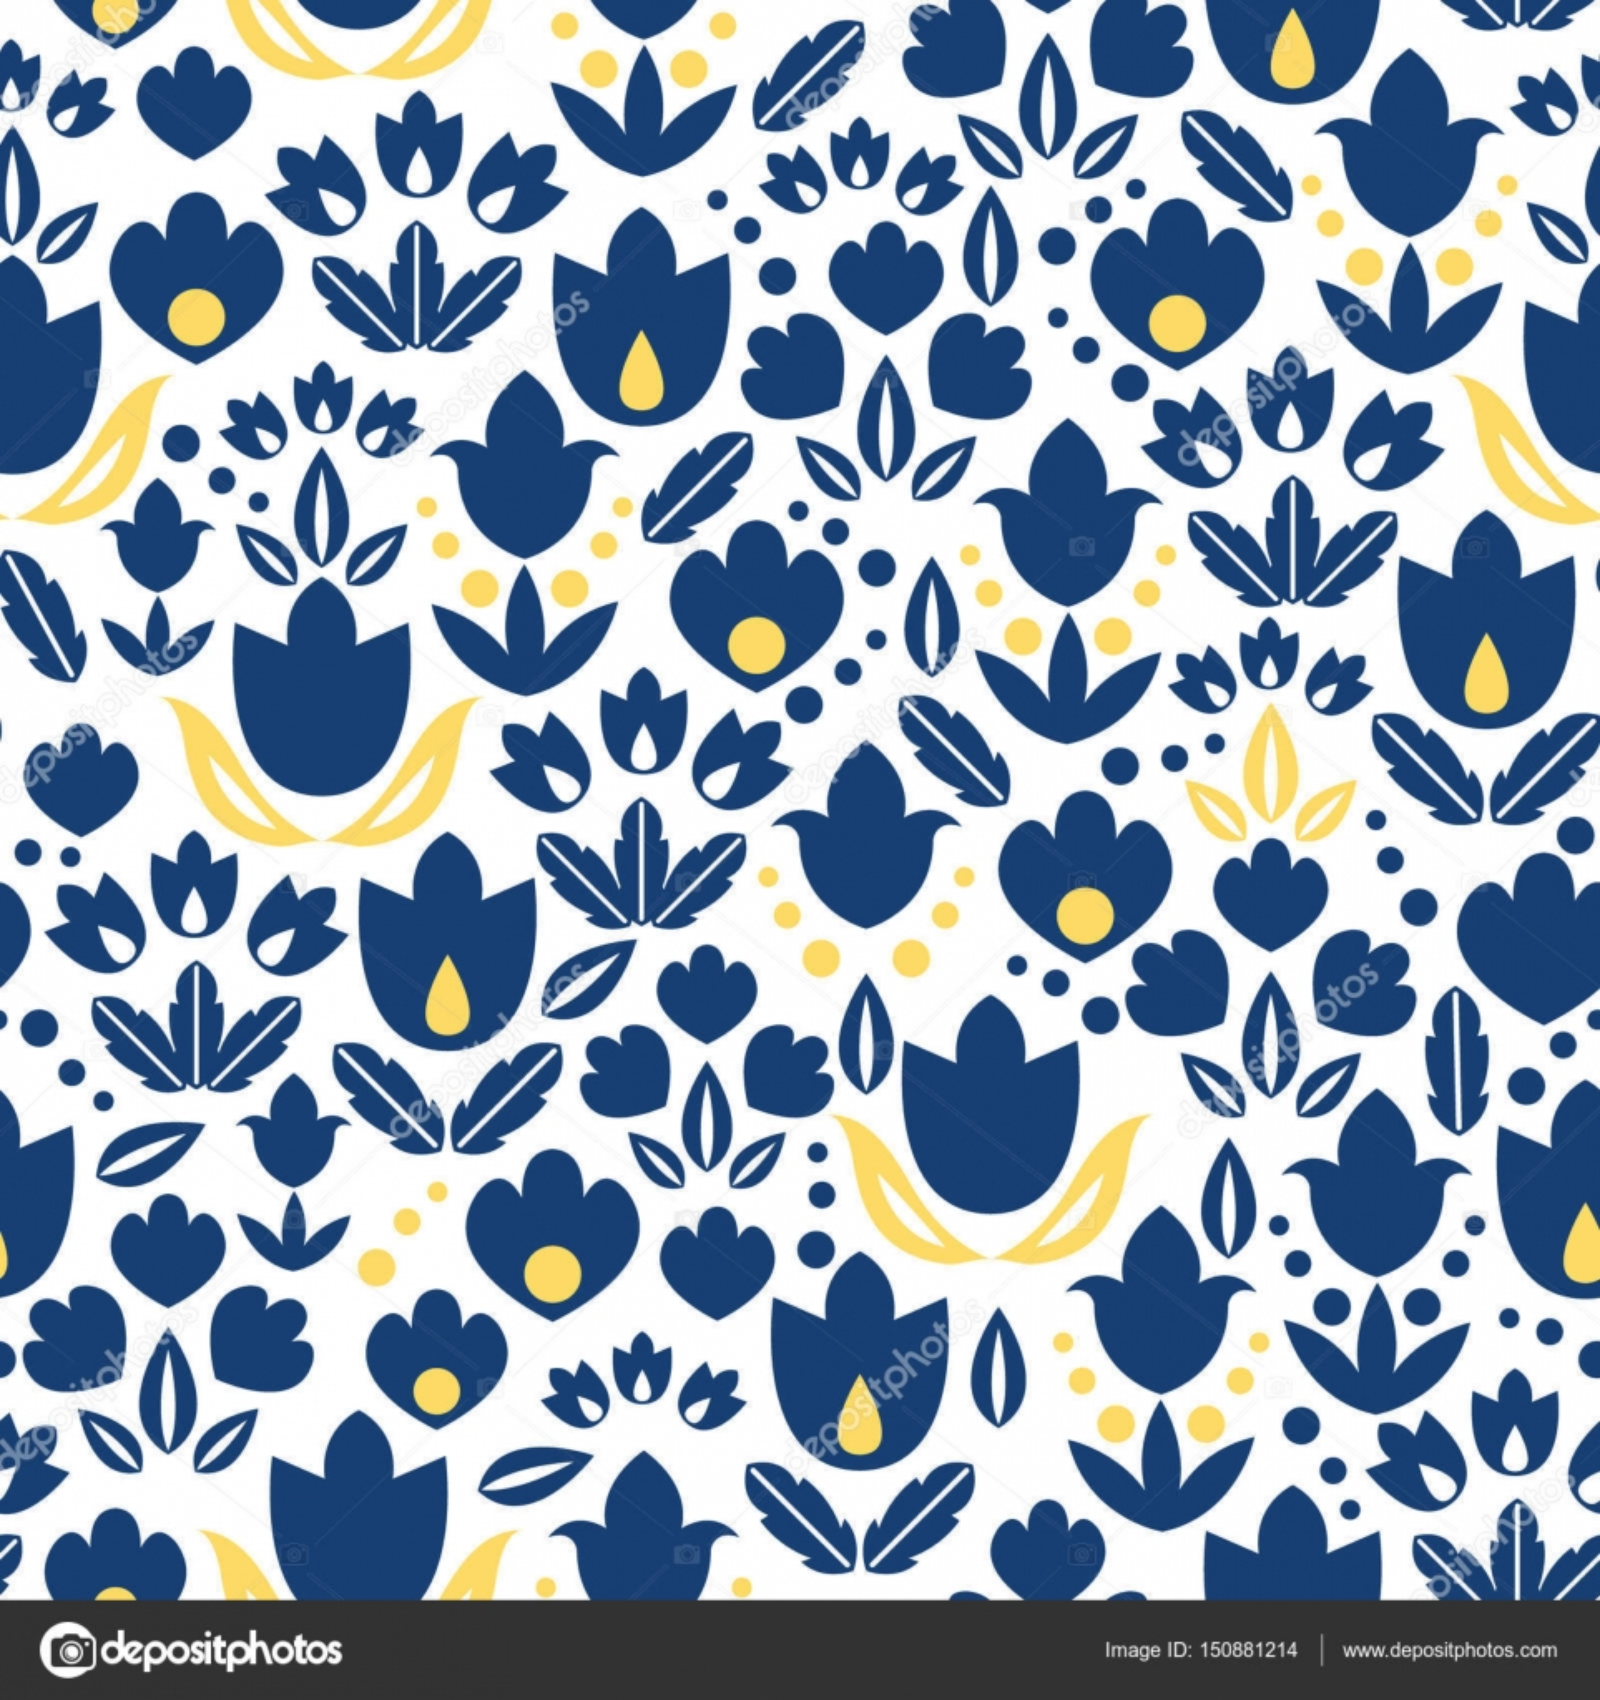 Vector Dark Blue Navy And Yellow Tulips Flowers Seamless